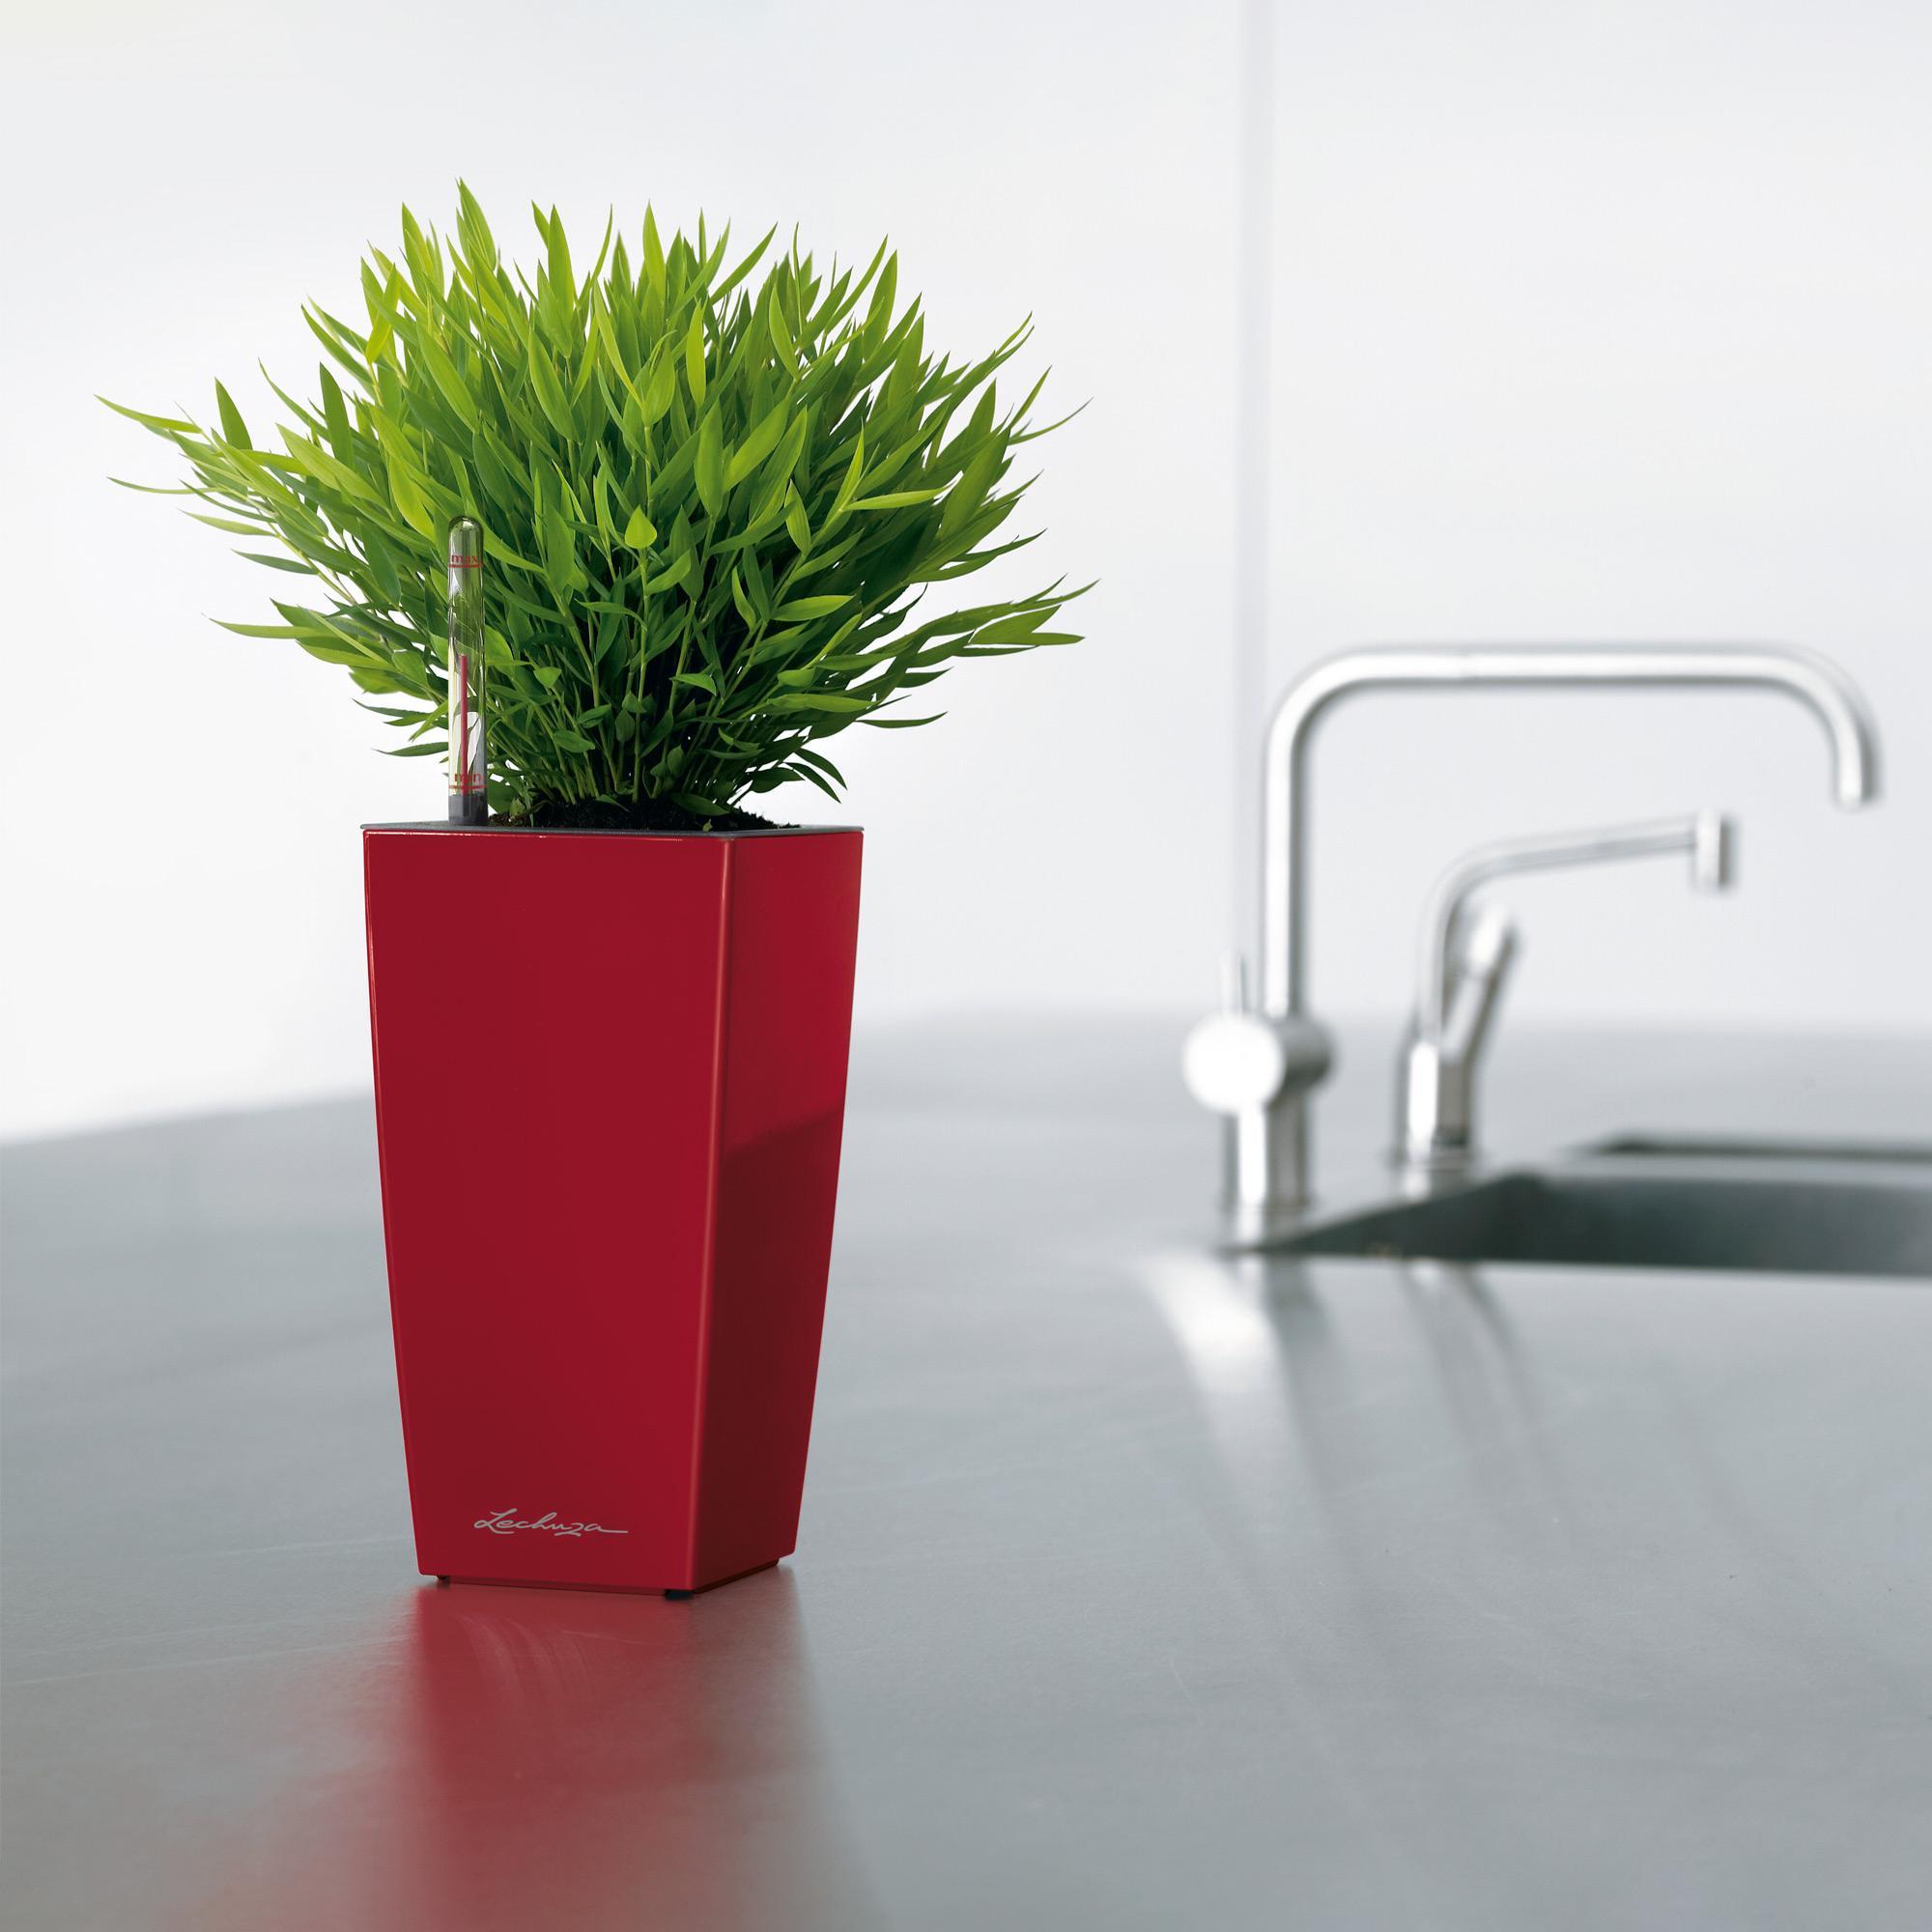 MAXI-CUBI pastel violet high-gloss - Image 6